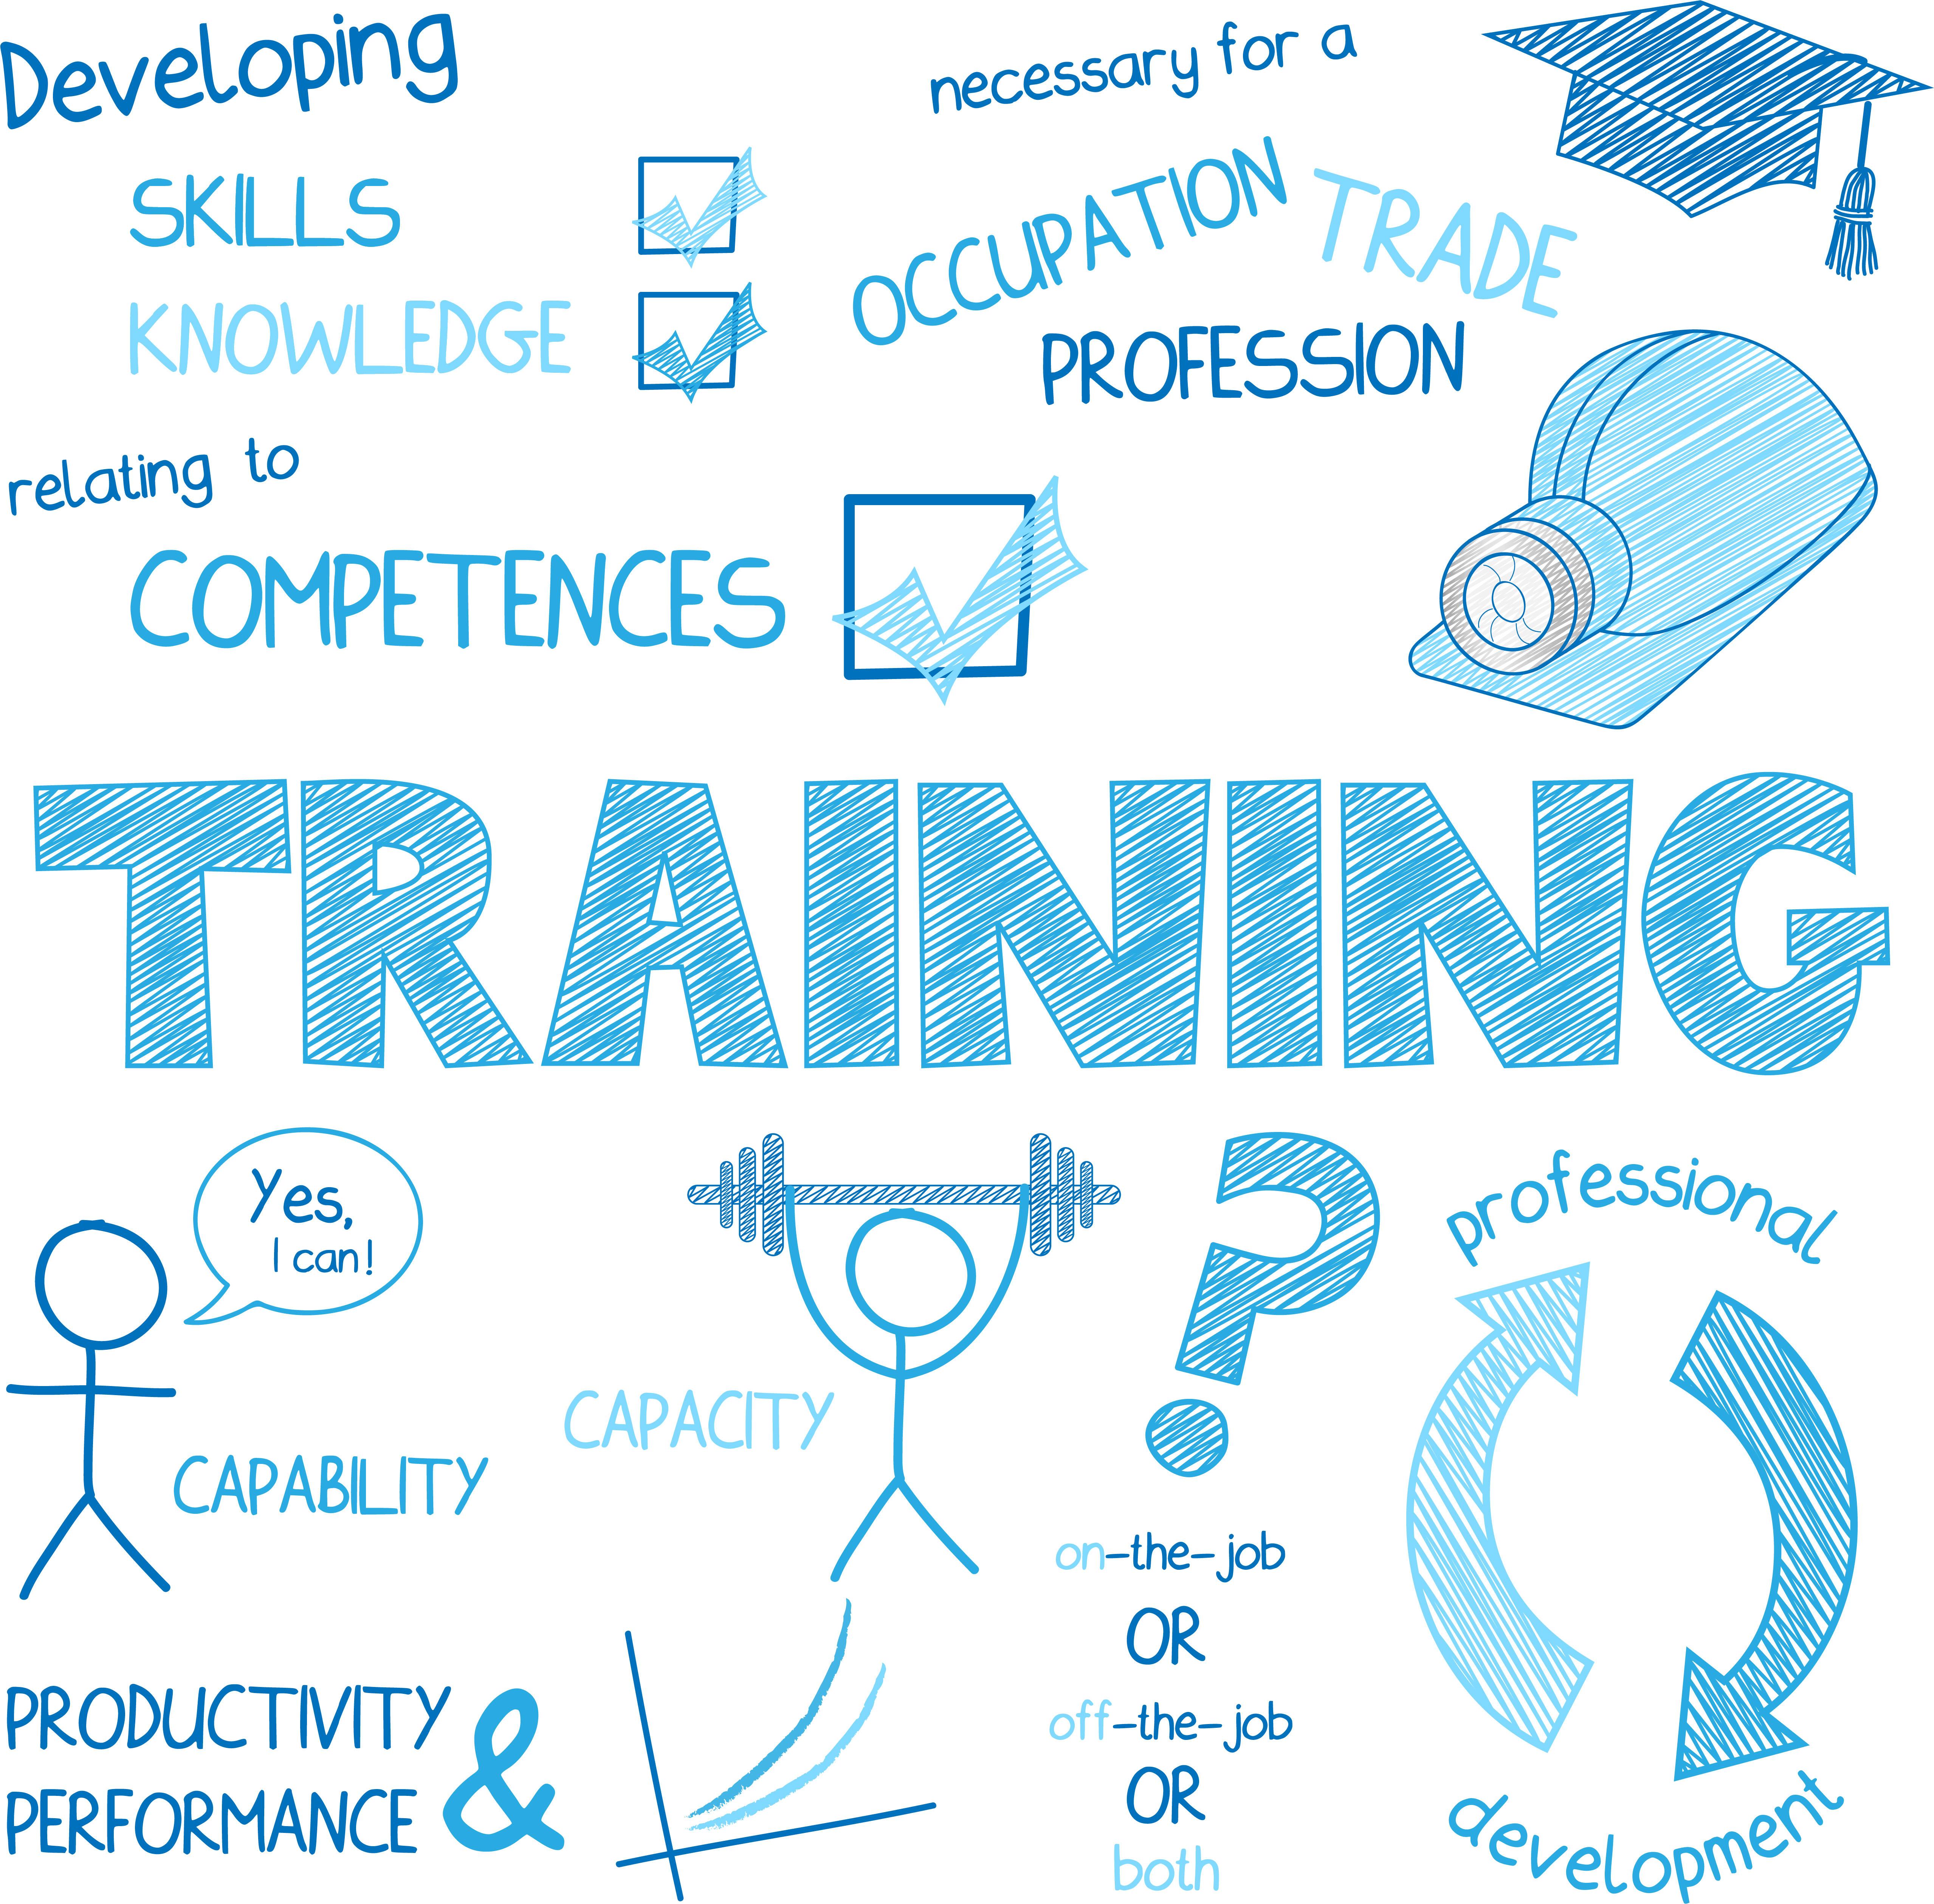 How can Kinteract help with teacher professional development?